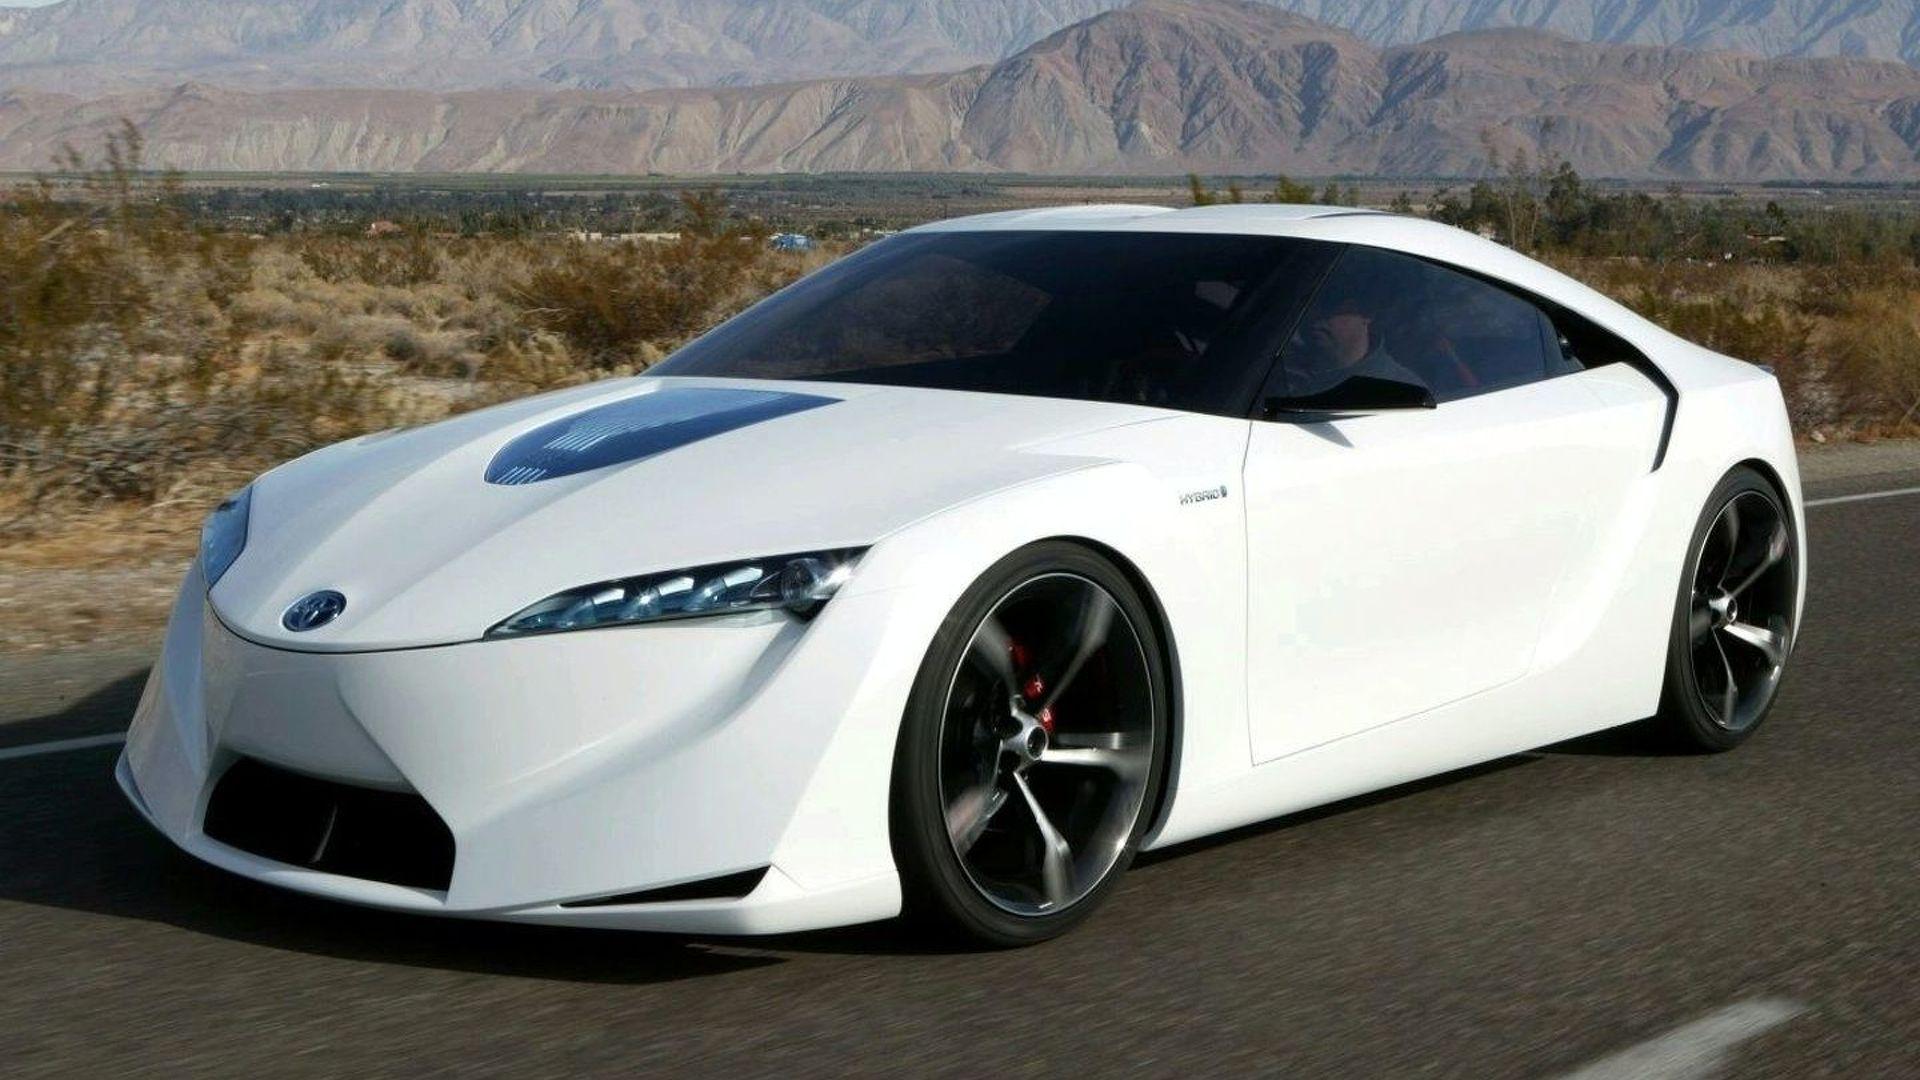 New Toyota / Subaru Sports Car Officially Announced